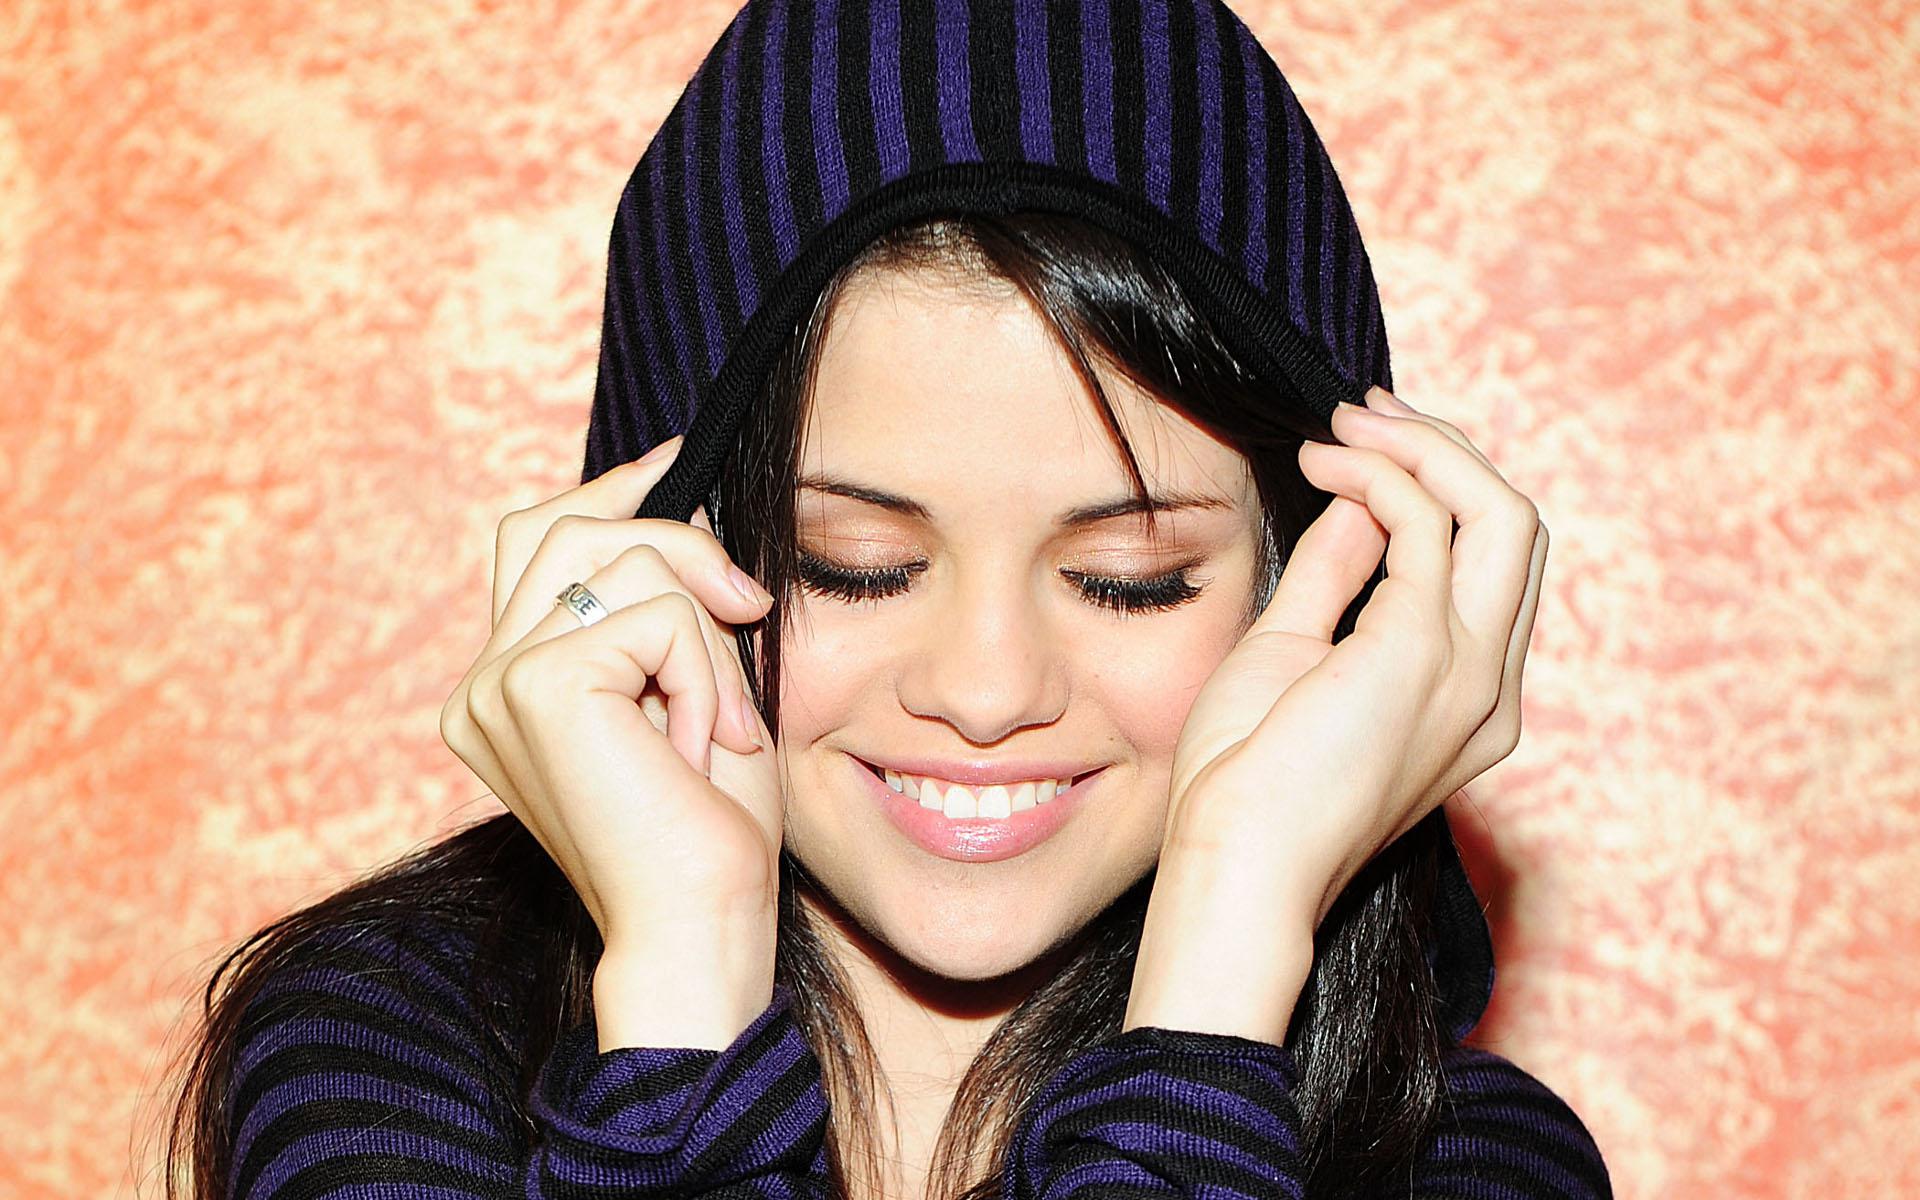 Selena Gomez Wallpaper 49